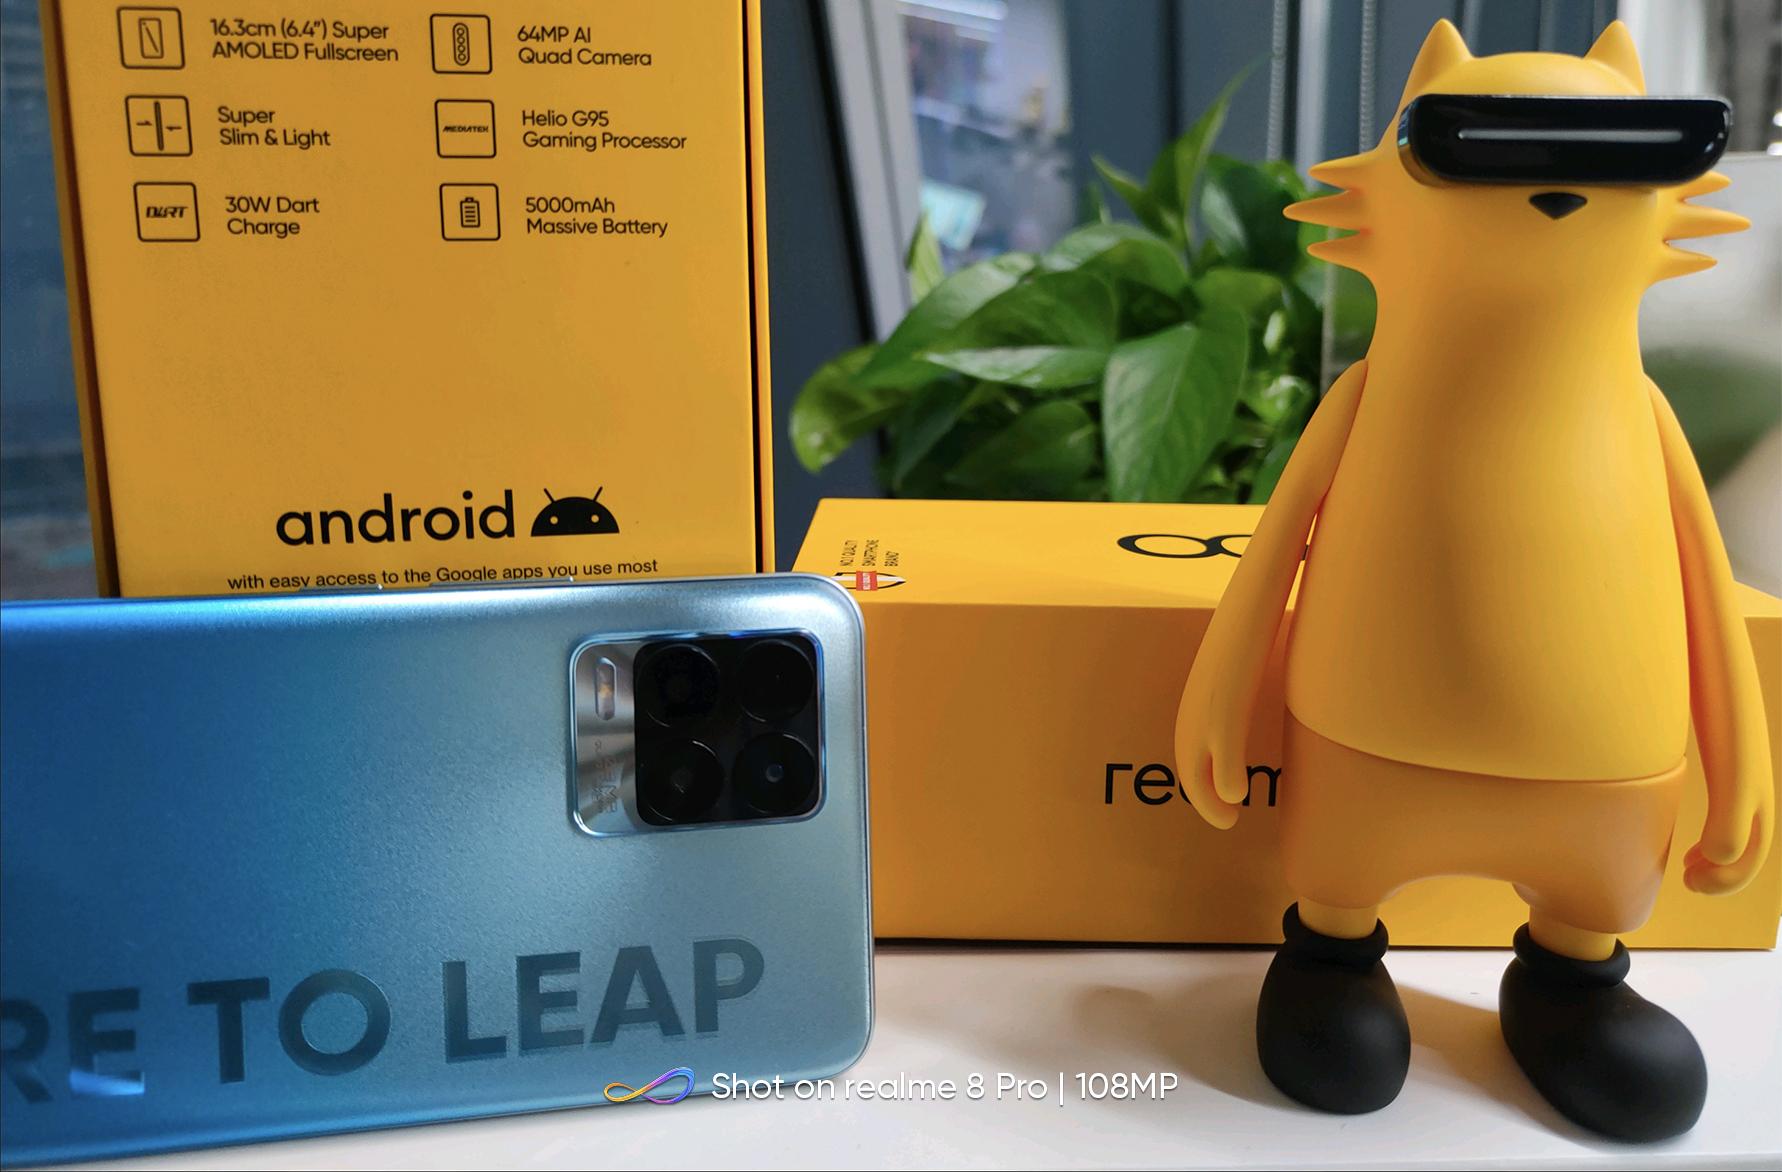 Realme 8 key specifications confirmed by Realme India CEO